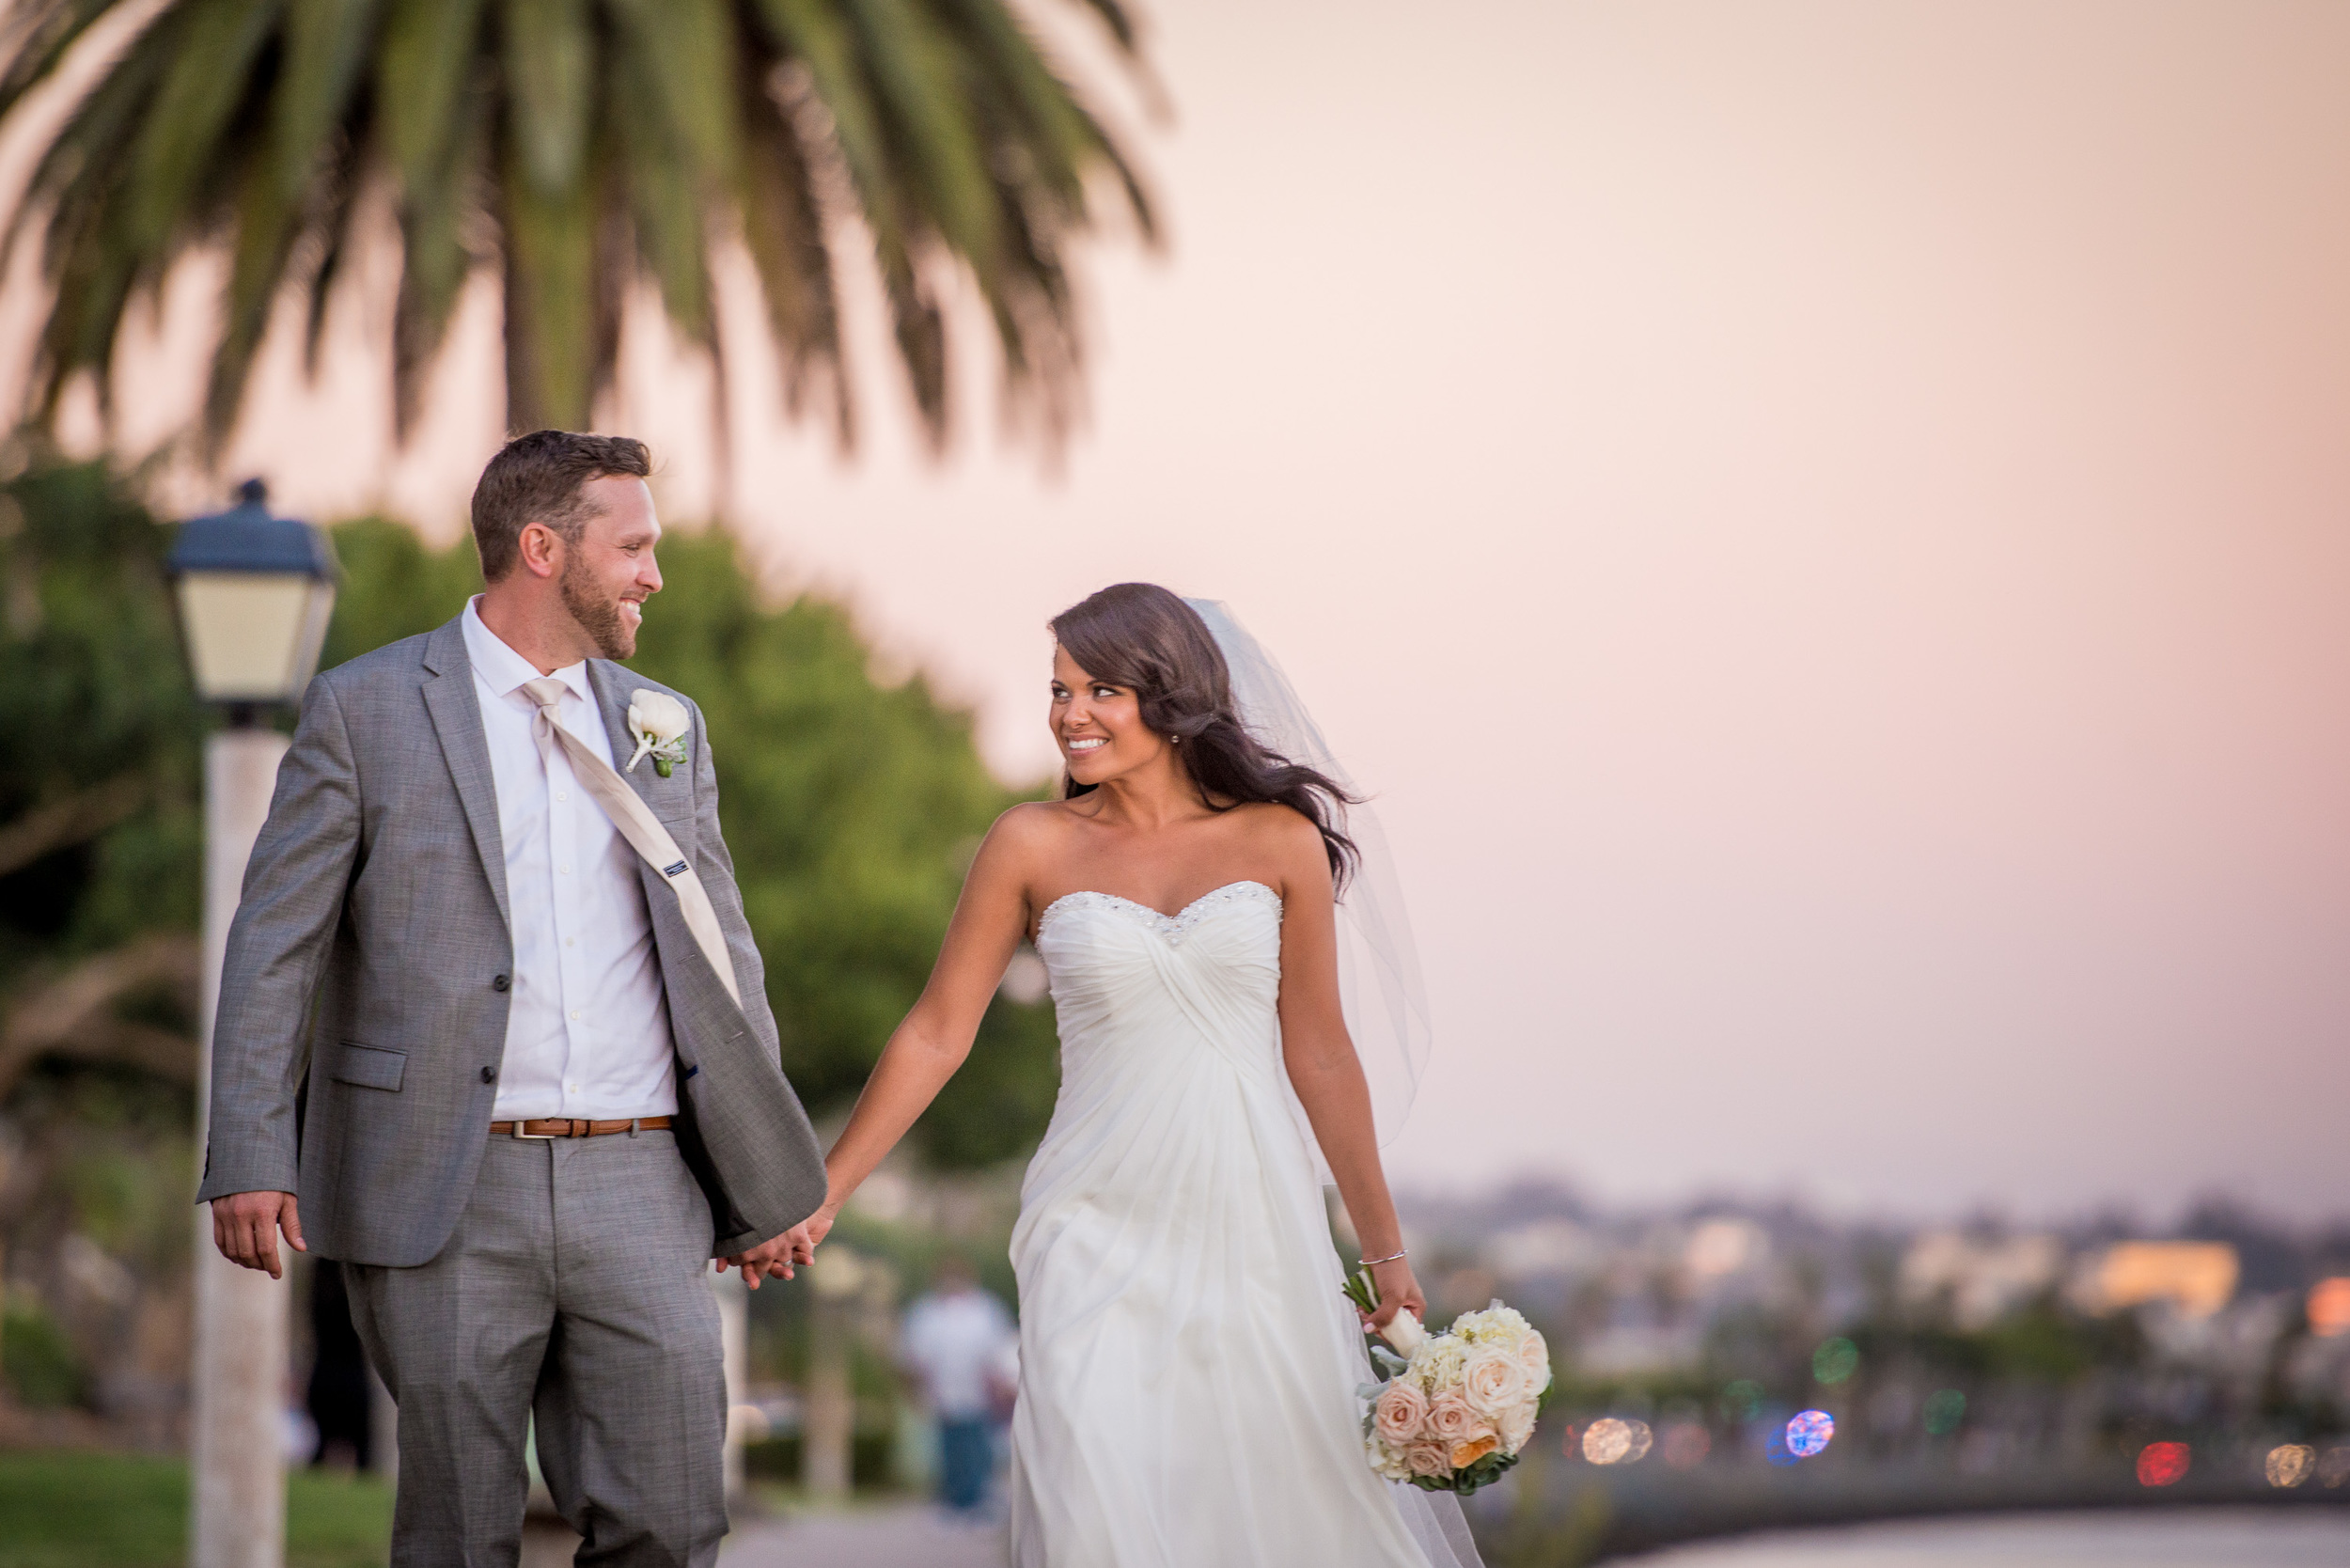 tom-hams-lighthouse-wedding-_D803160.jpg